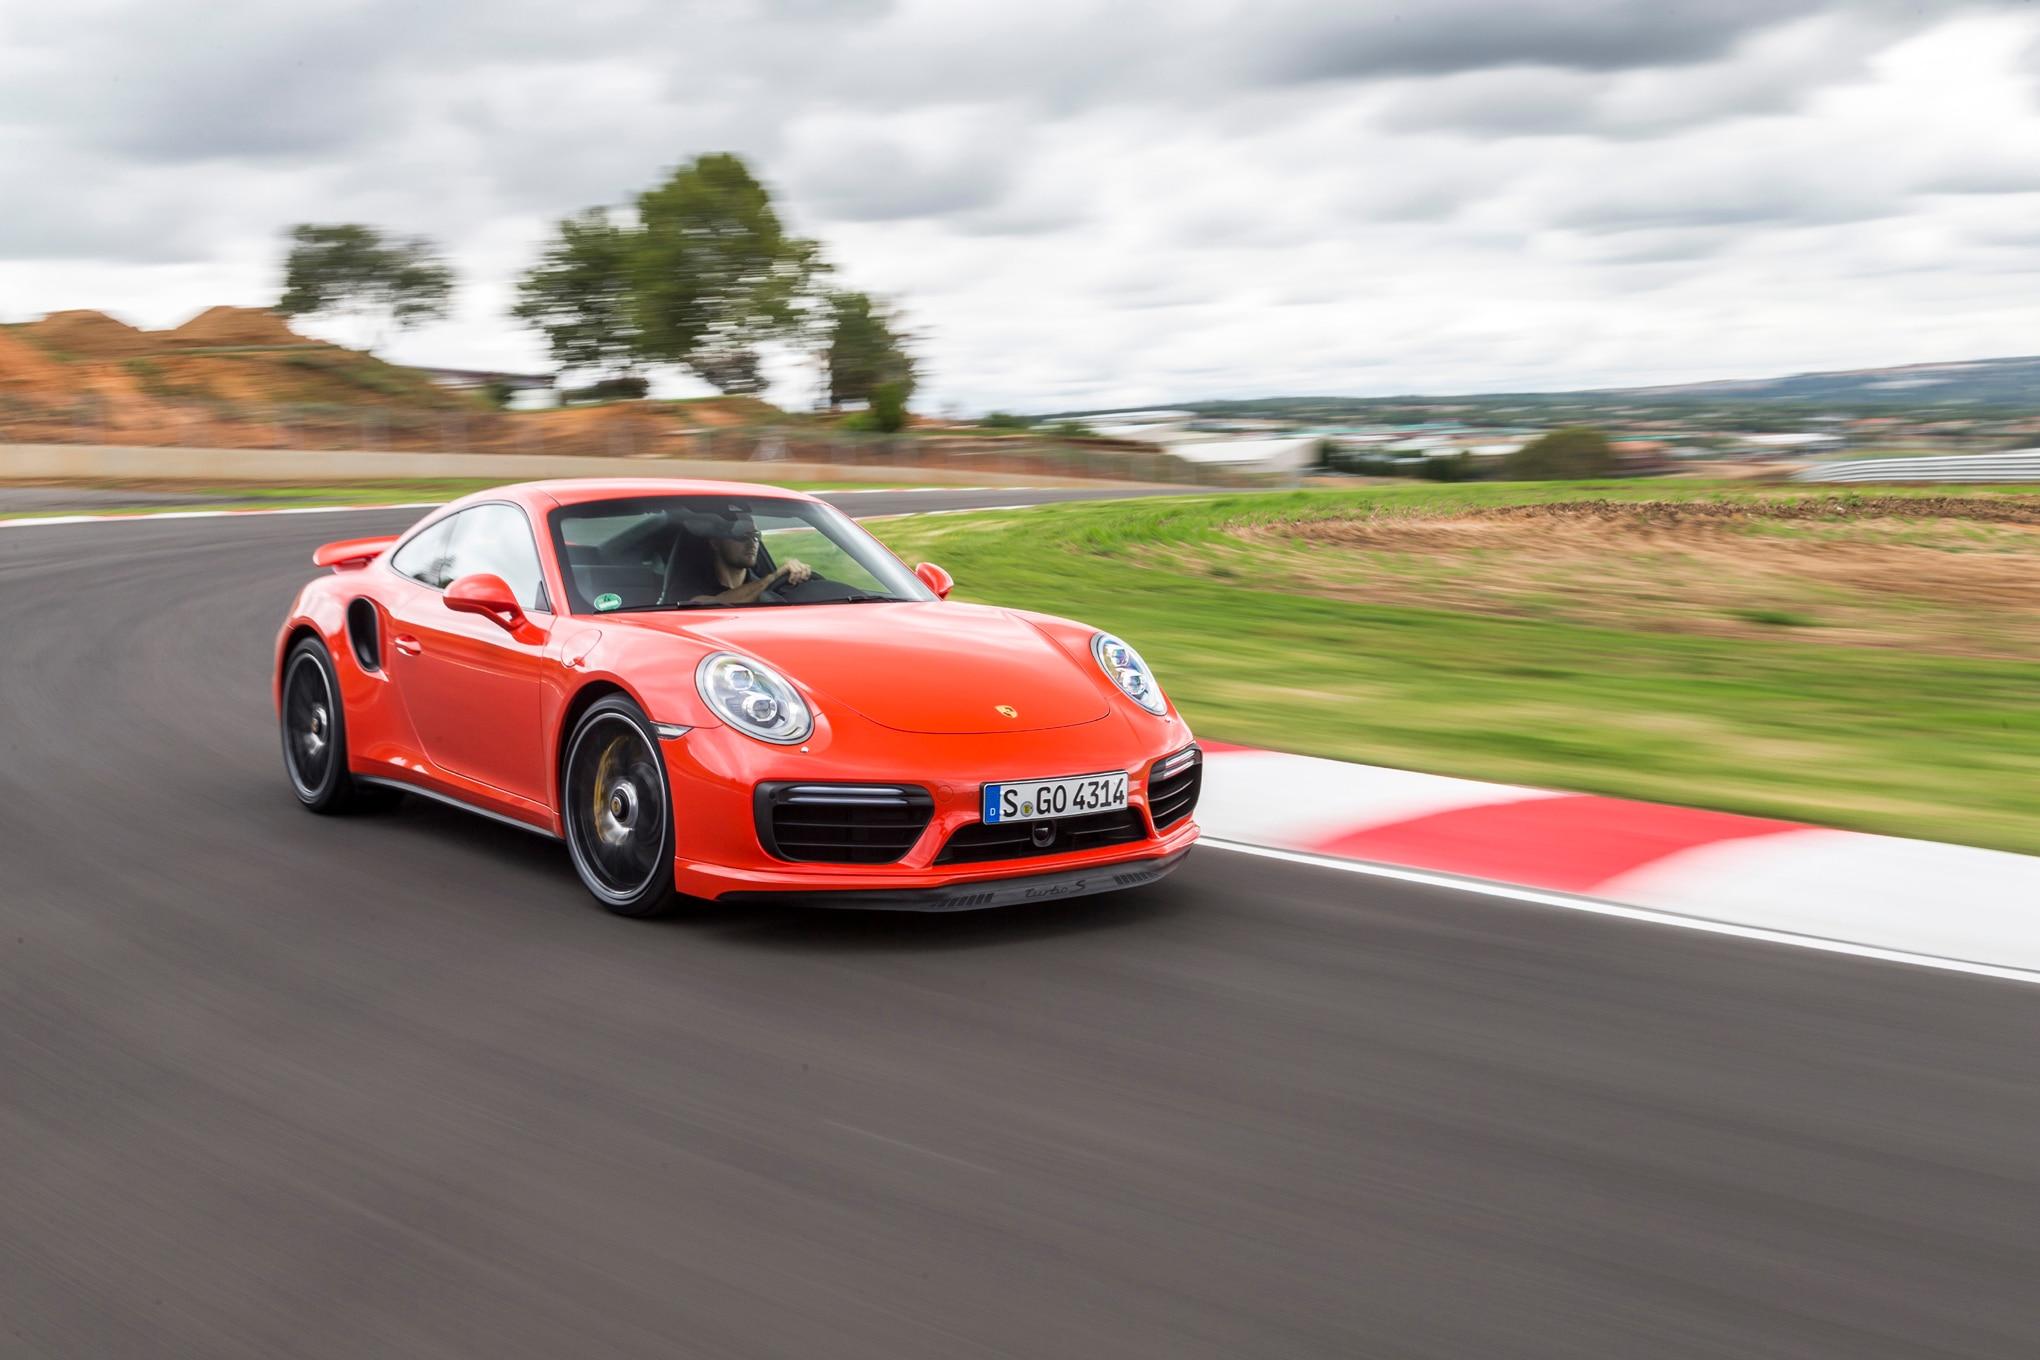 2017 Porsche 911 Turbo S front three quarter in motion 02